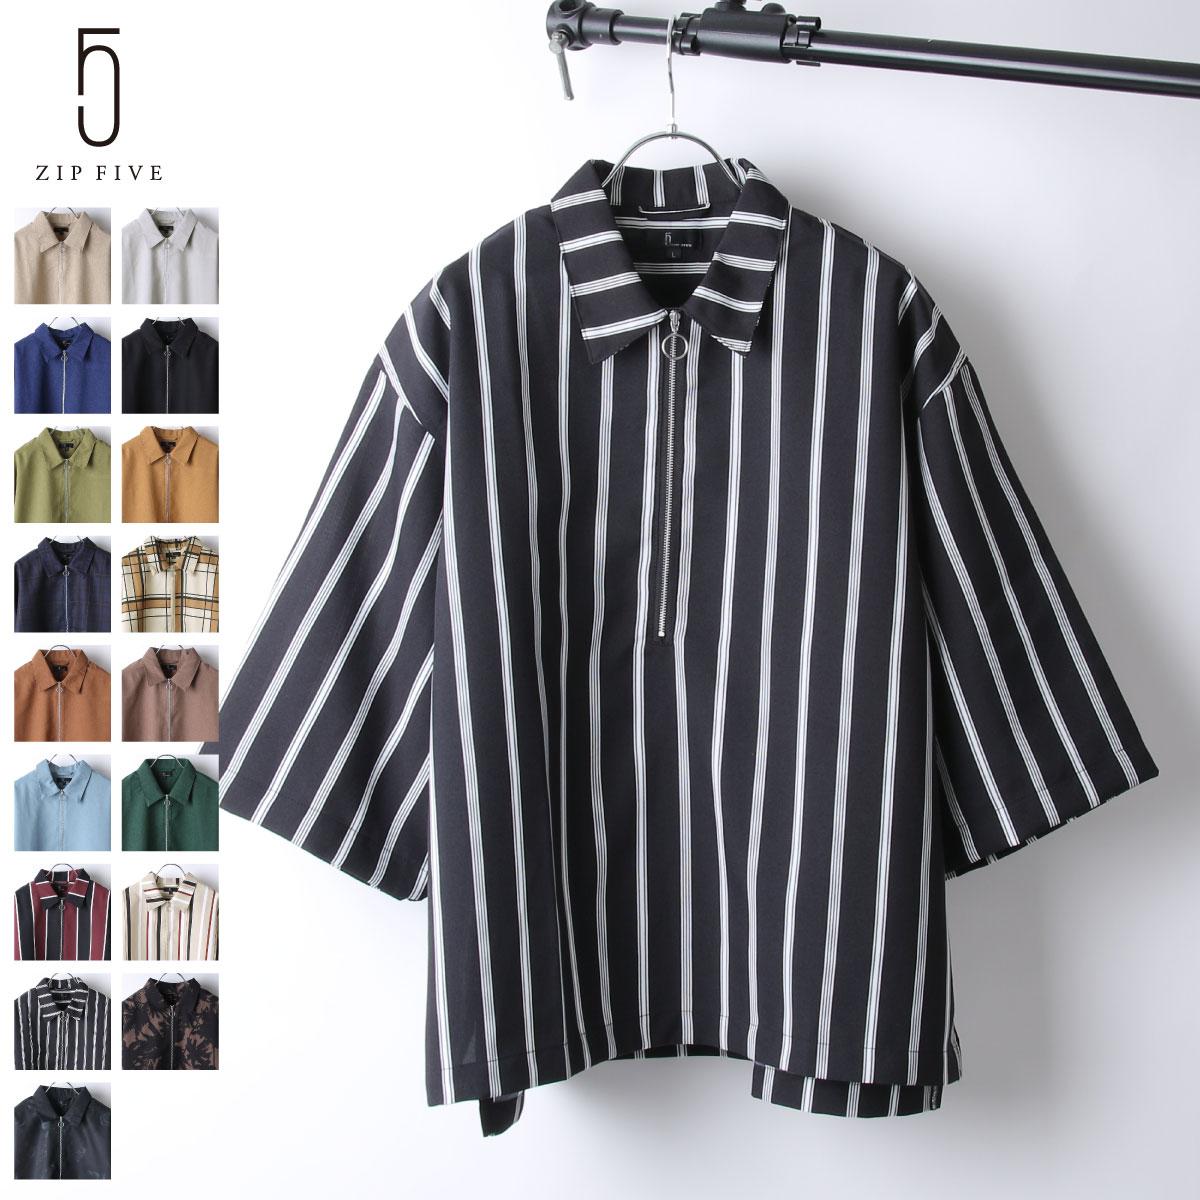 【ZIP】半拉鍊套頭衫 短袖 ZIP FIVE 襯衫 短袖 春裝 1